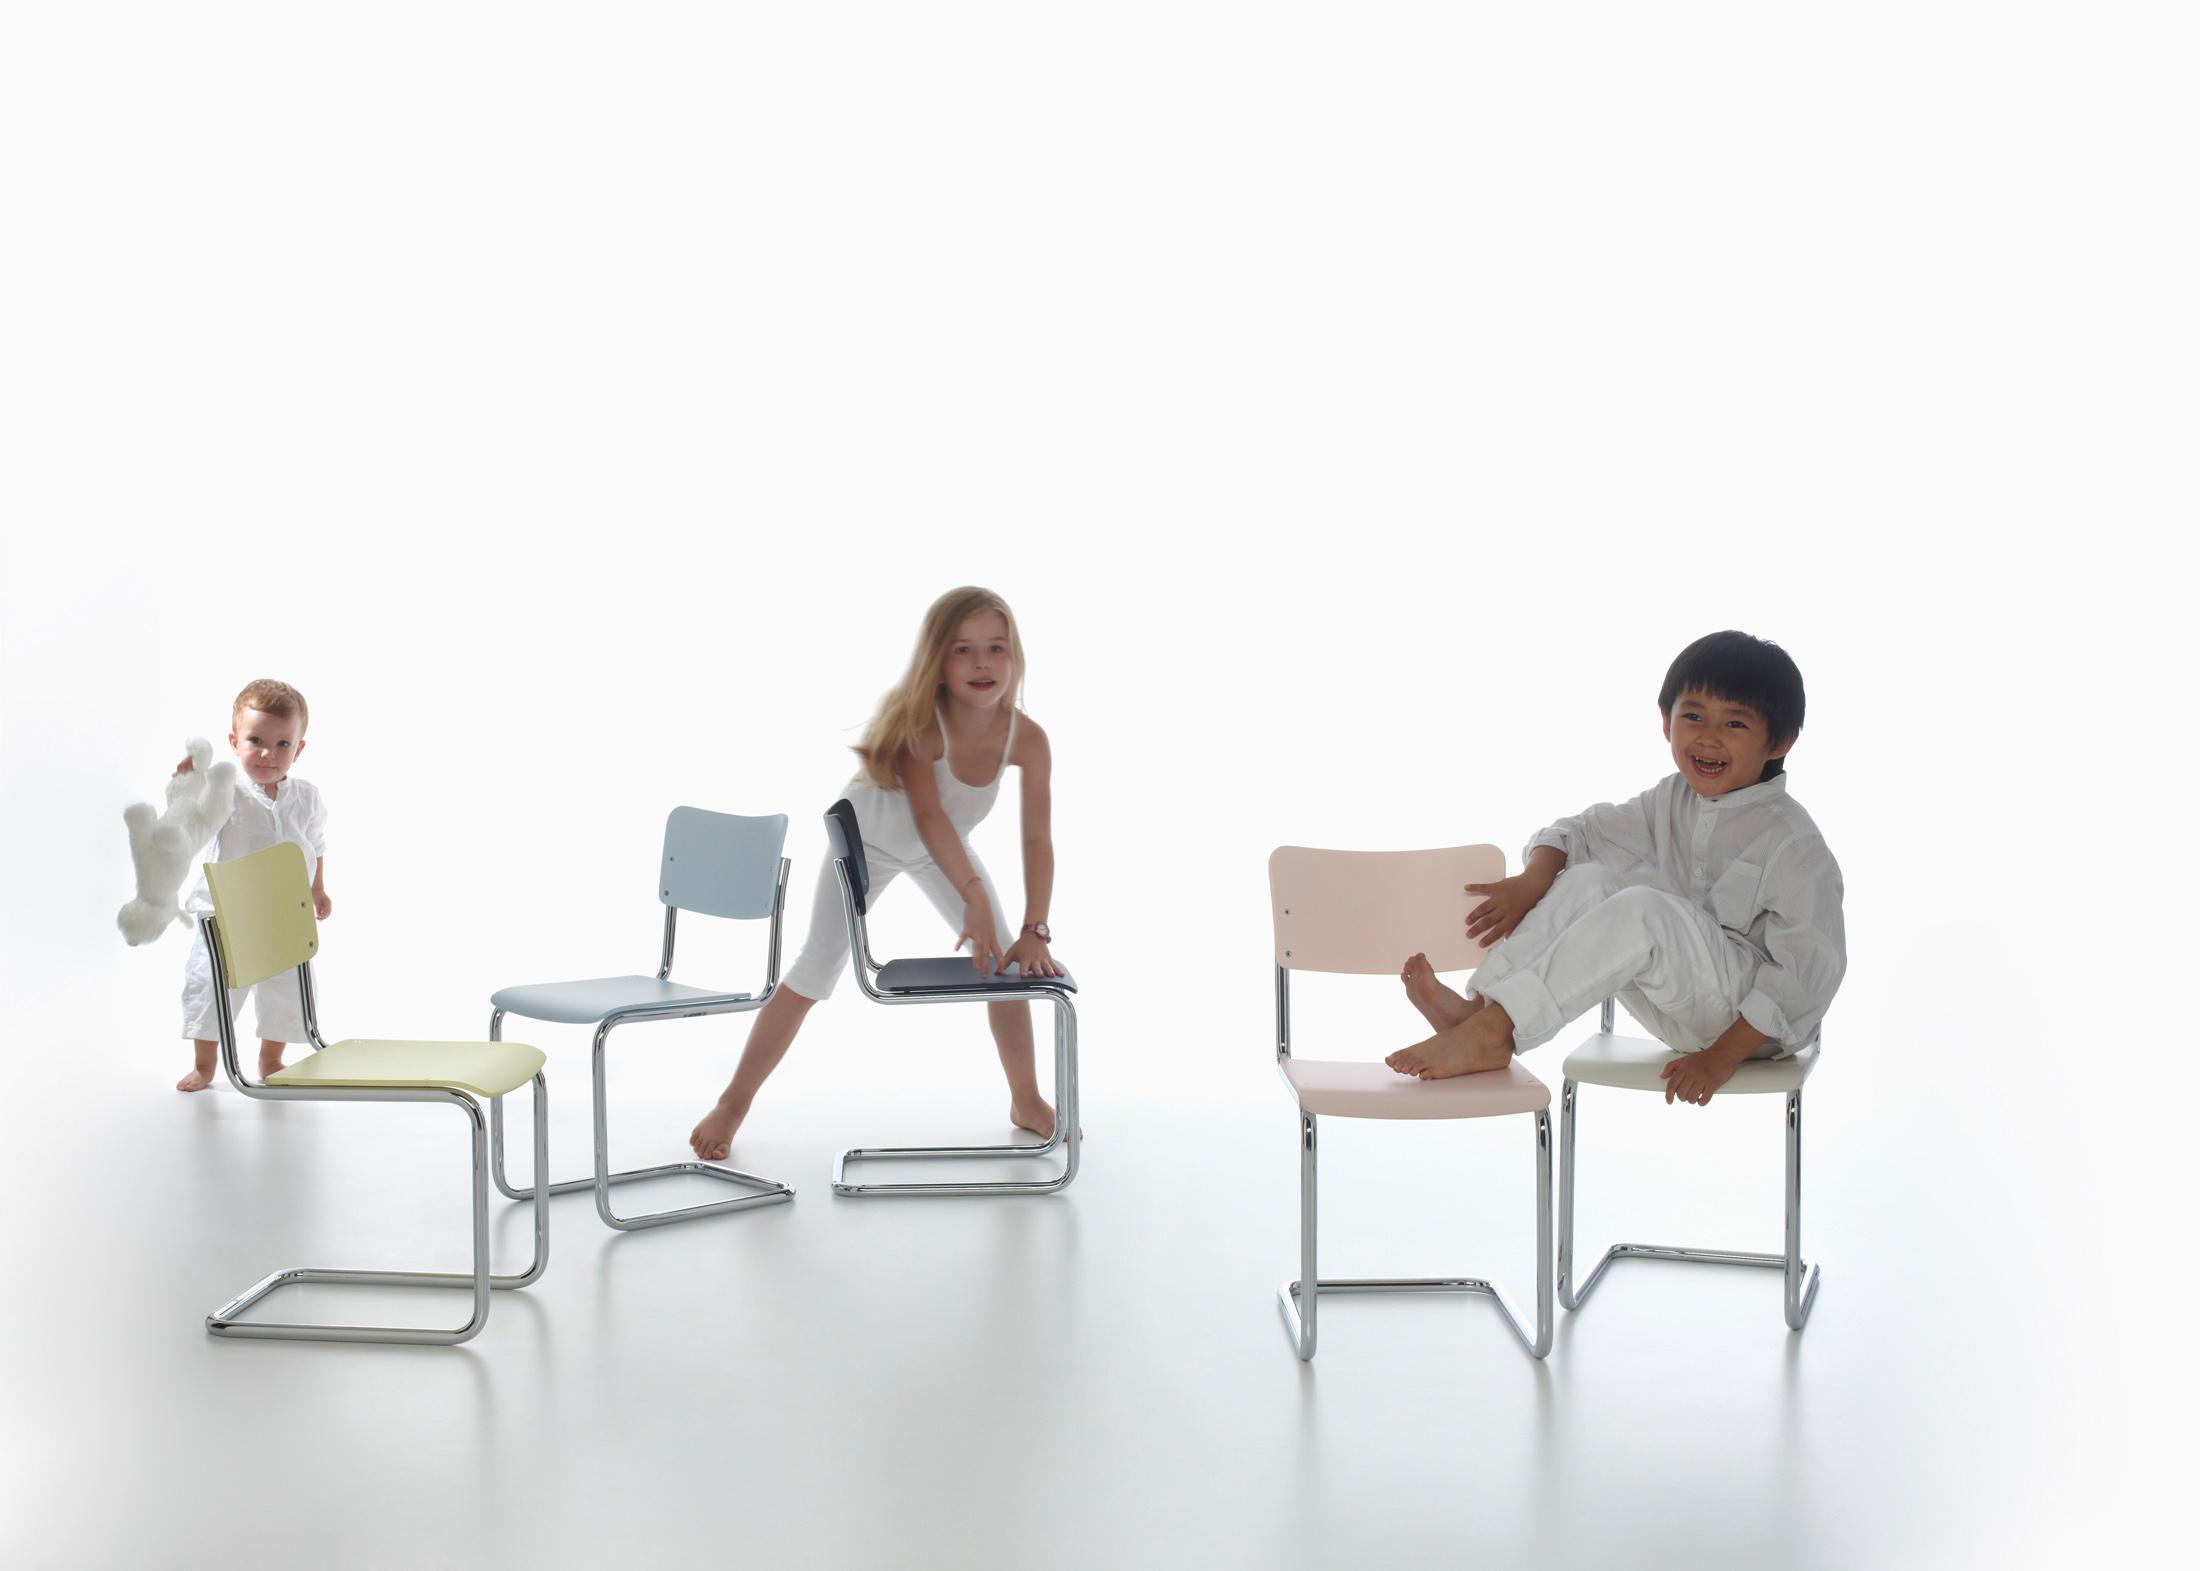 s 43 k kinderbereich von thonet architonic. Black Bedroom Furniture Sets. Home Design Ideas